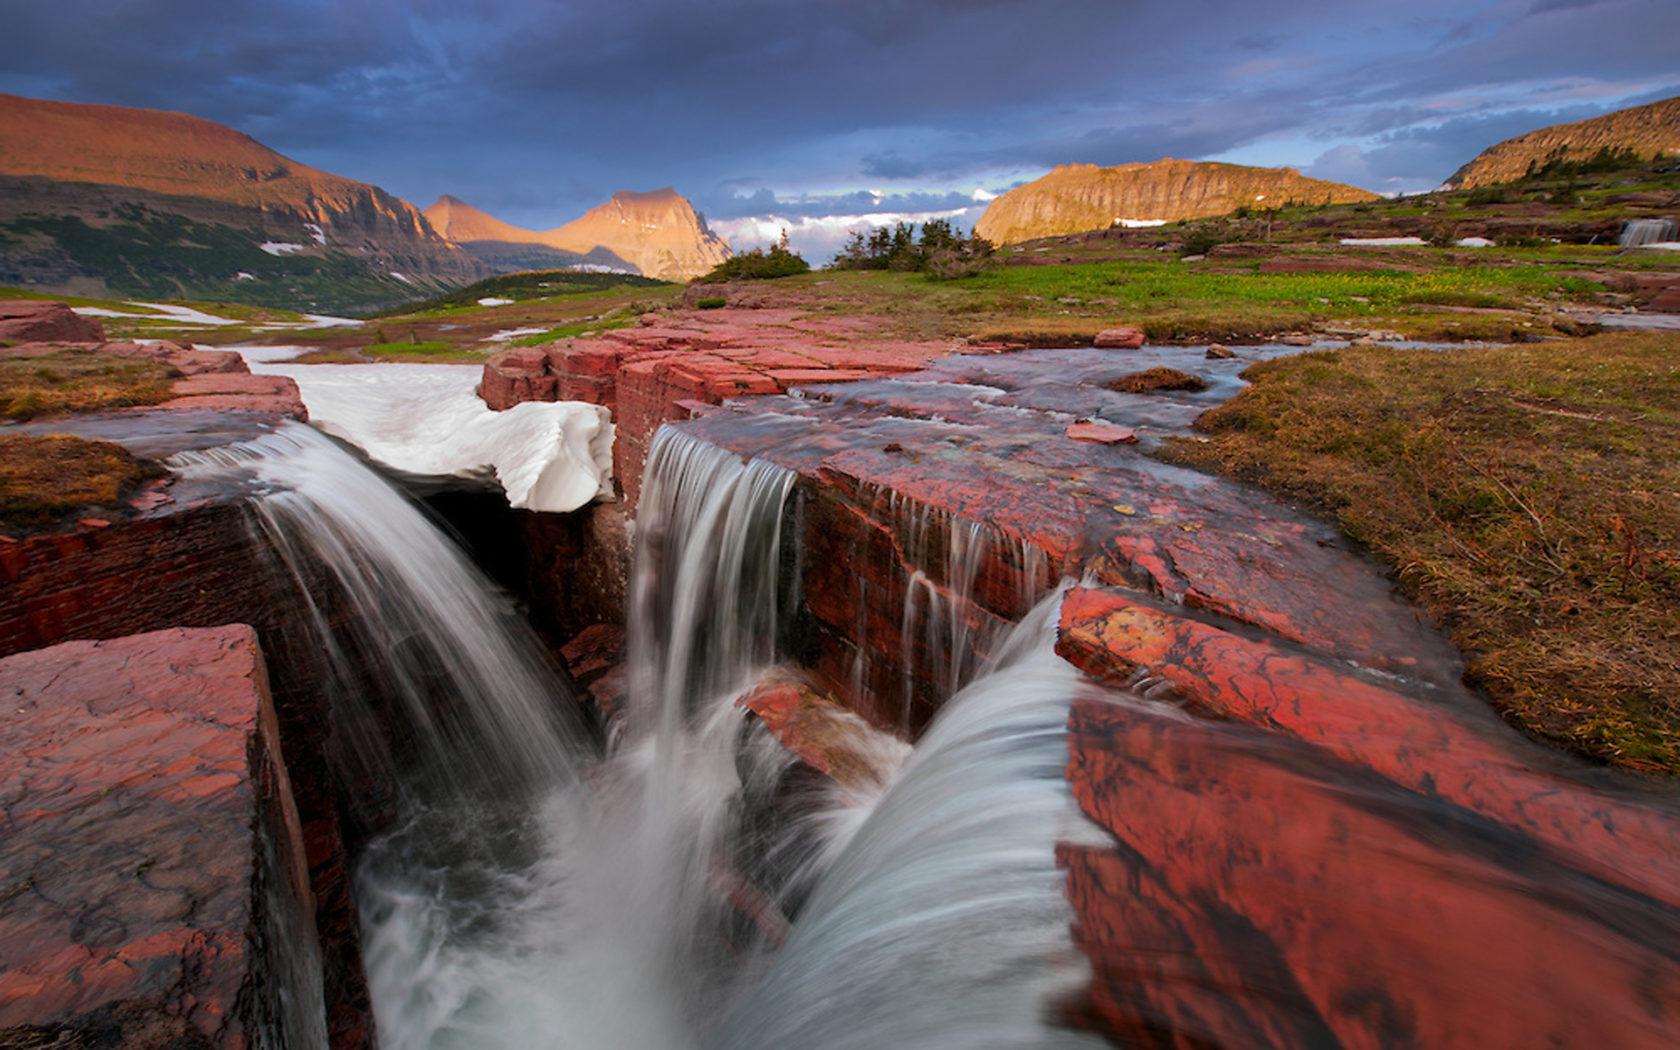 Wallpaper Backgrounds Fall Natural Mountain Stream Waterfall Stones Rocks Triple